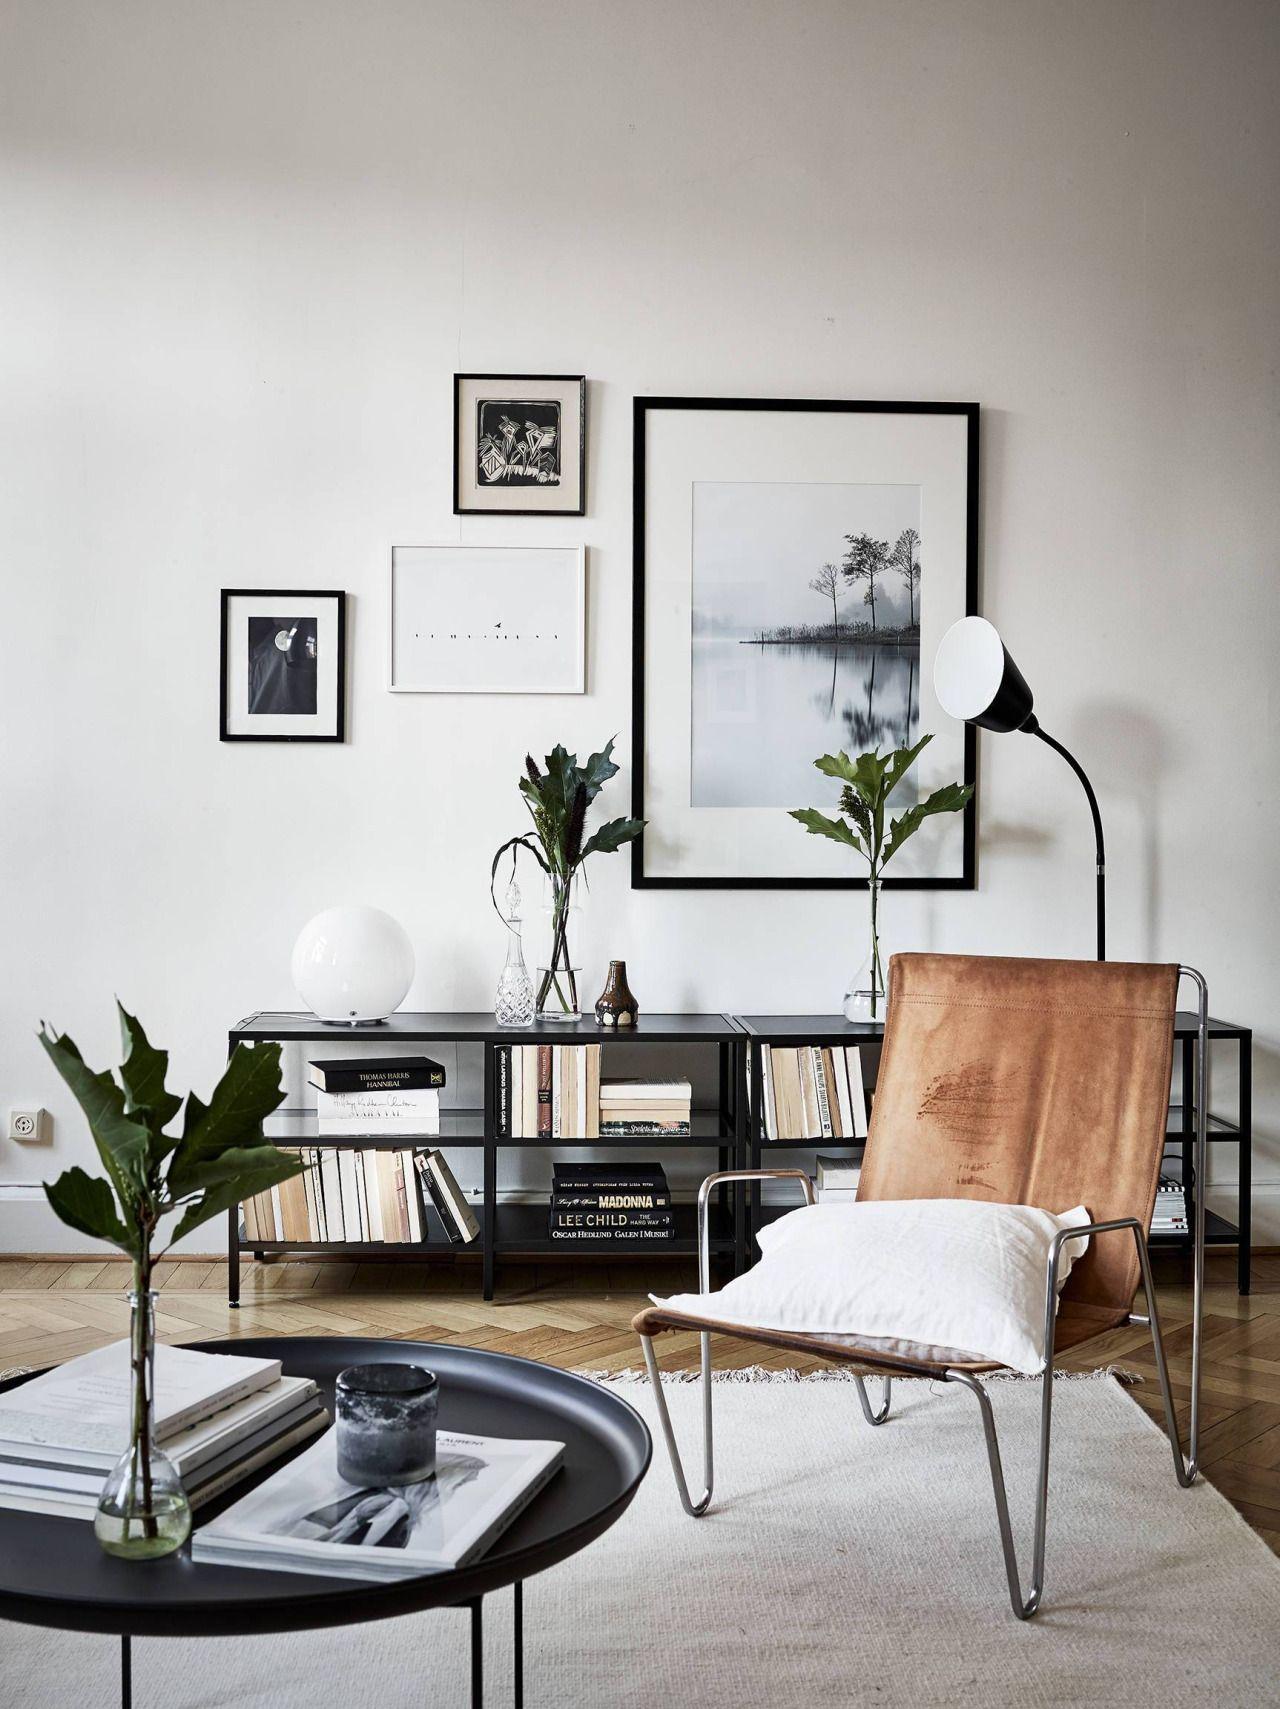 Scandinavian Home Decor You Ll Love Www Delightfull Eu Blog Scandinaviandesign Scandinaviandesign Room Interior Minimalist Living Room Living Room Interior